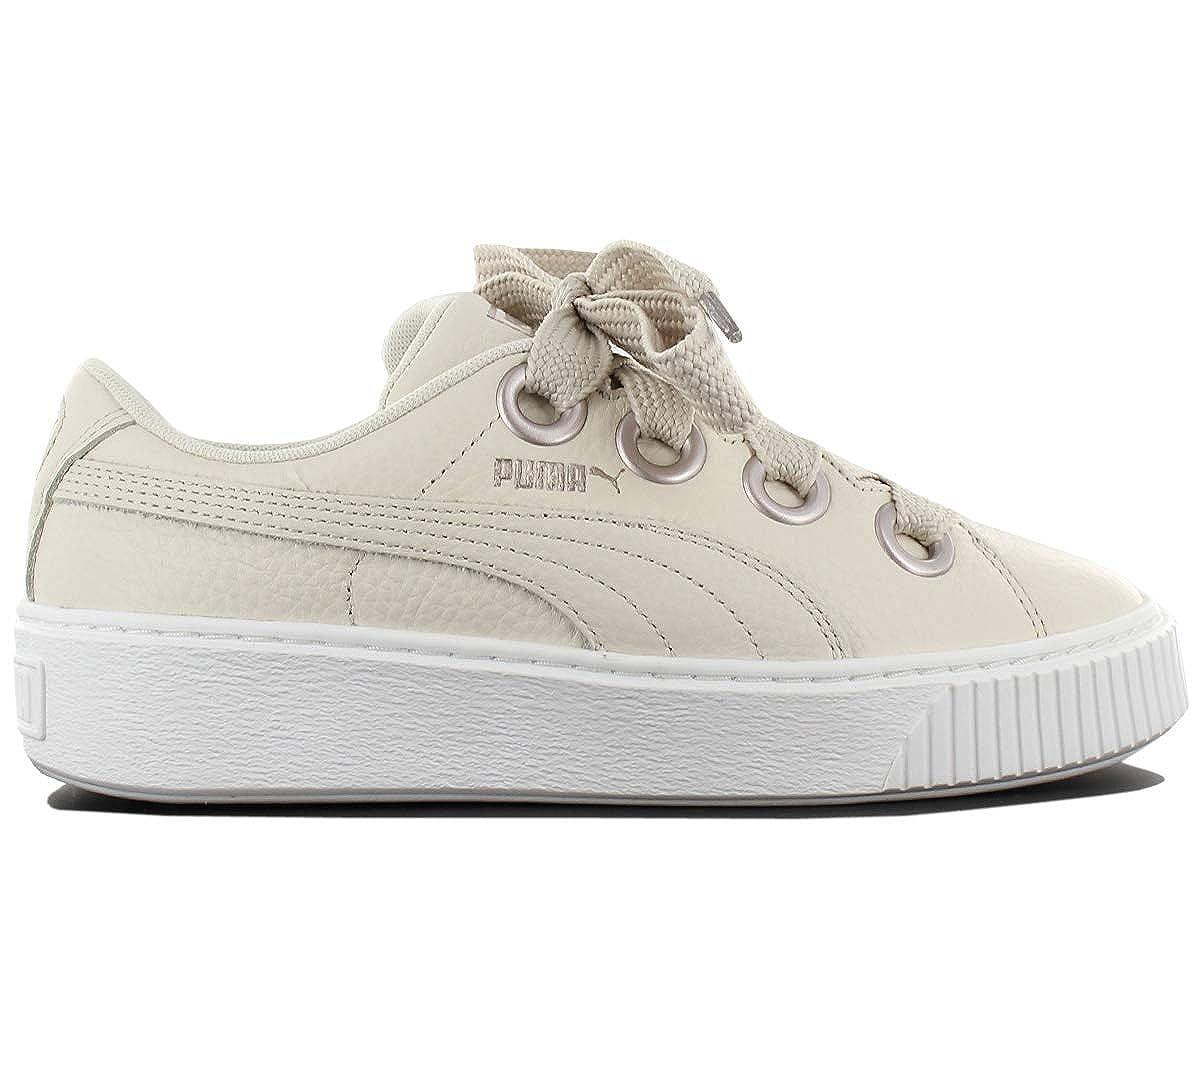 on sale 0a520 840ef Puma Platform Kiss Trainers Natural: Amazon.co.uk: Shoes & Bags